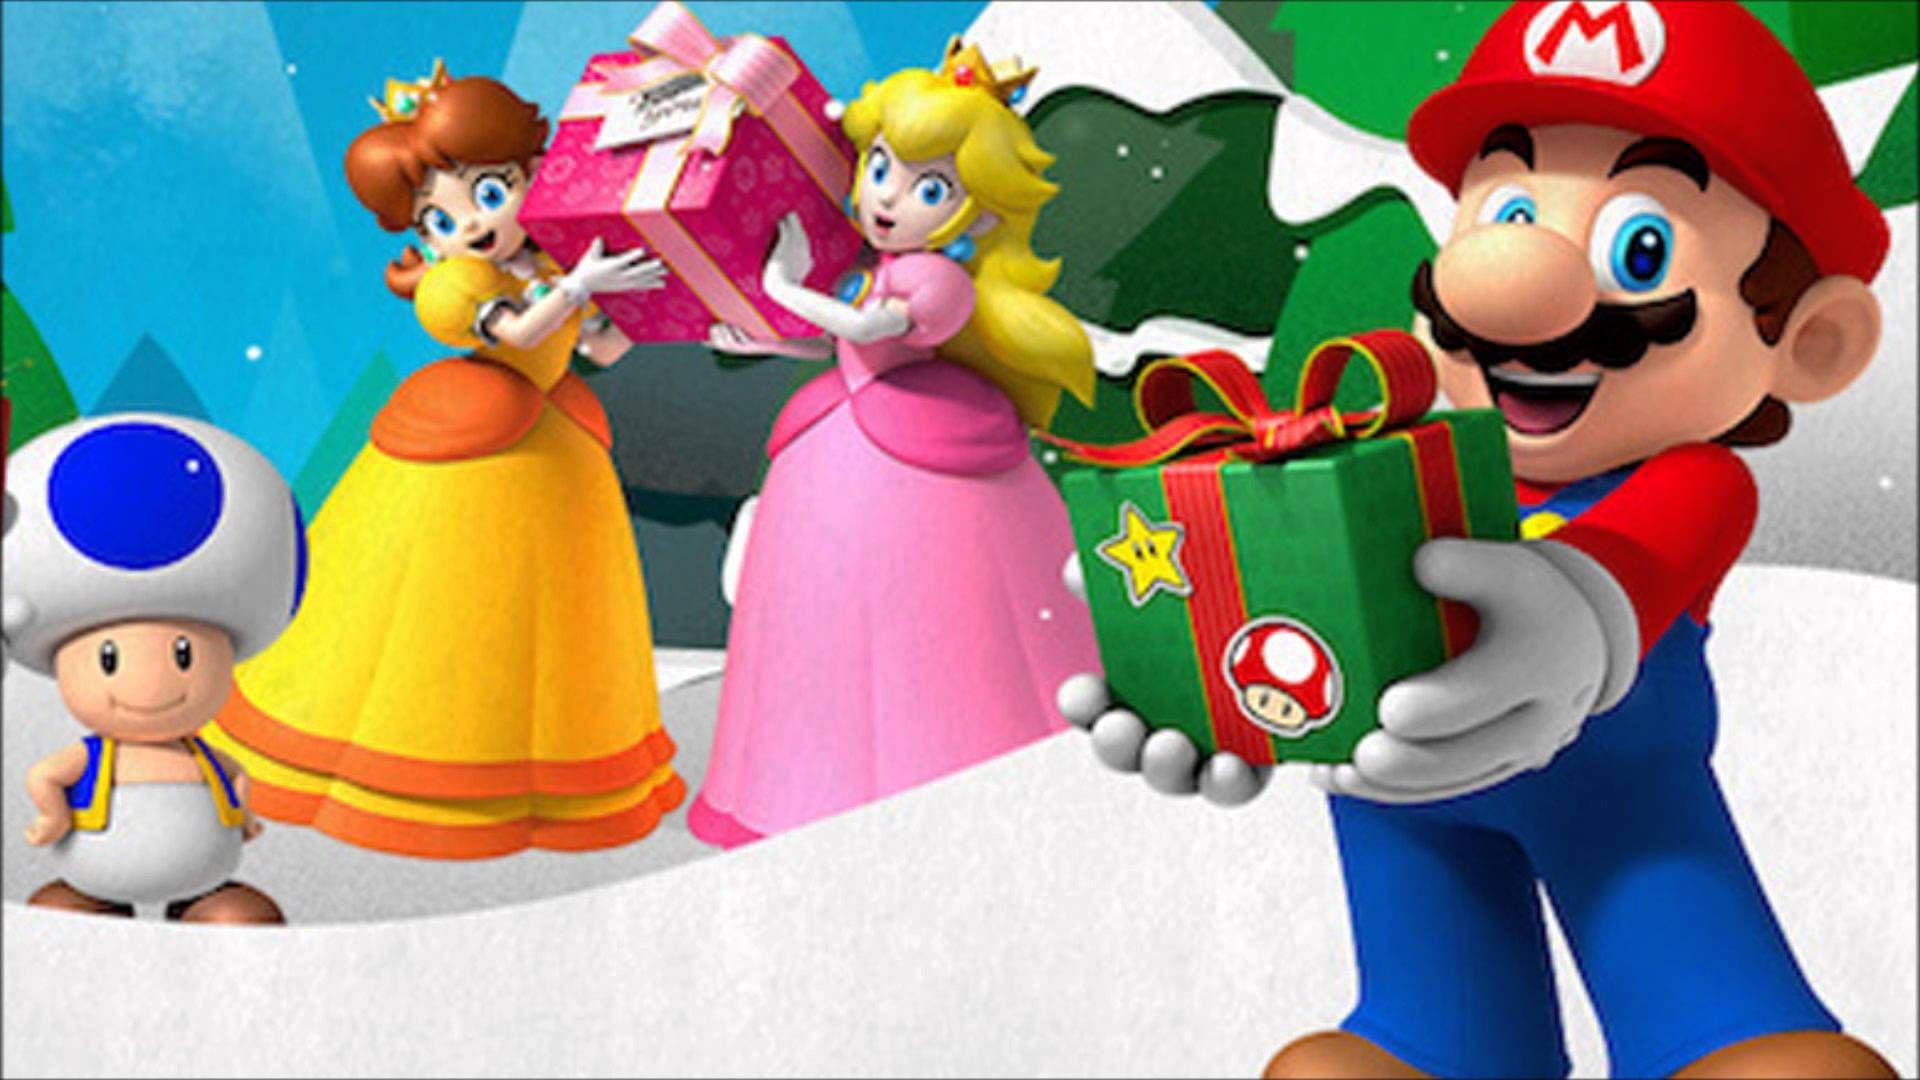 Super Mario Bros Overworld (Winter Christmas) - NES Remix 2 ...